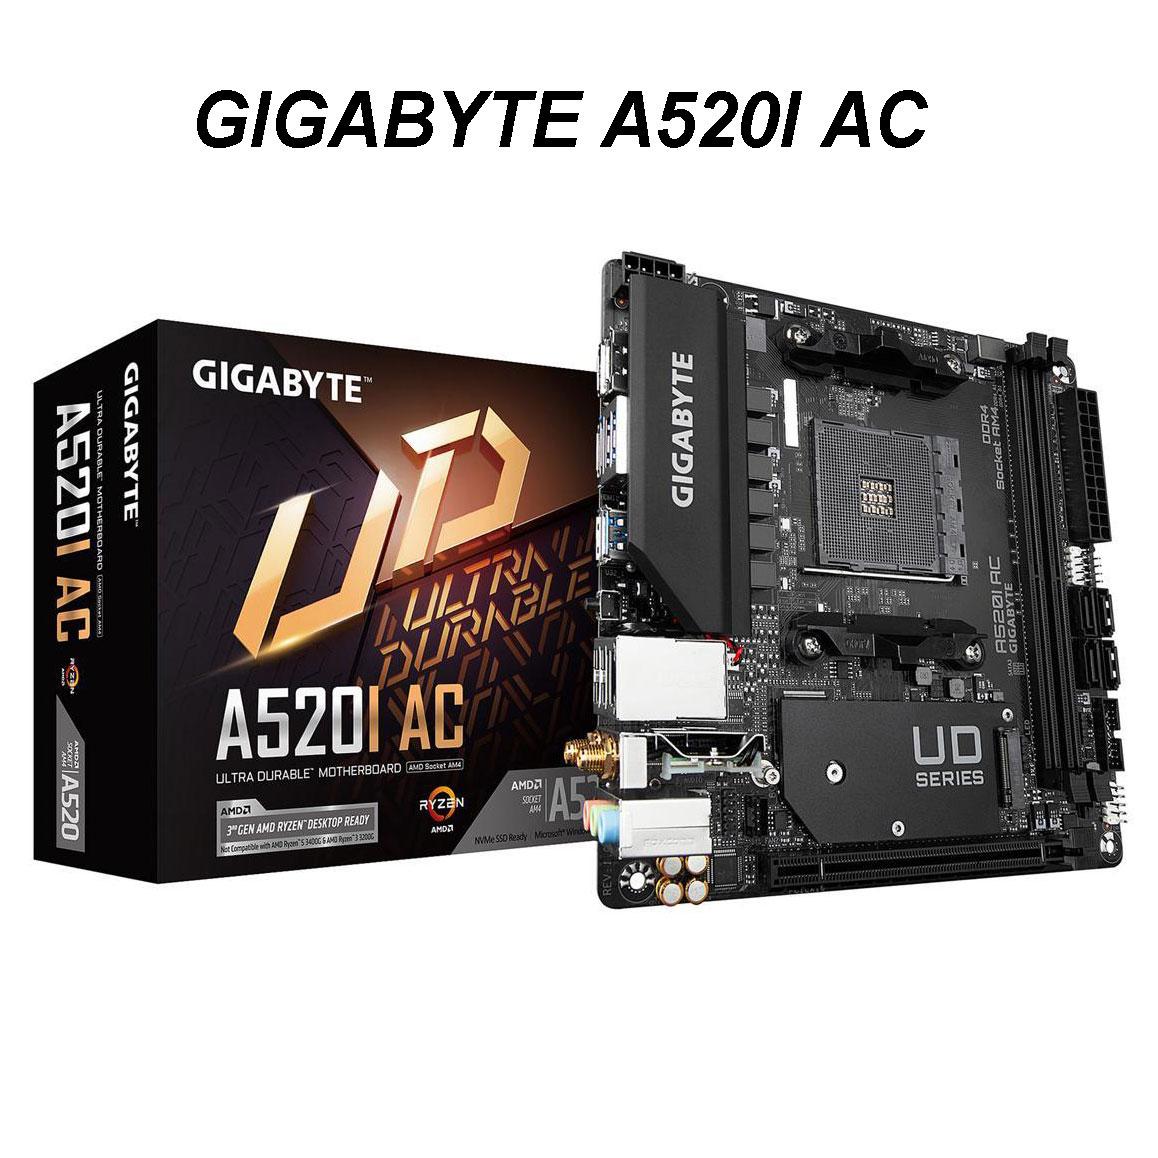 Gigabyte ga a520i ac placa-mãe mitx am4 direto 6 fases digital pwm com 55a drmos, intel wifi + bluetooth, nvme pcie